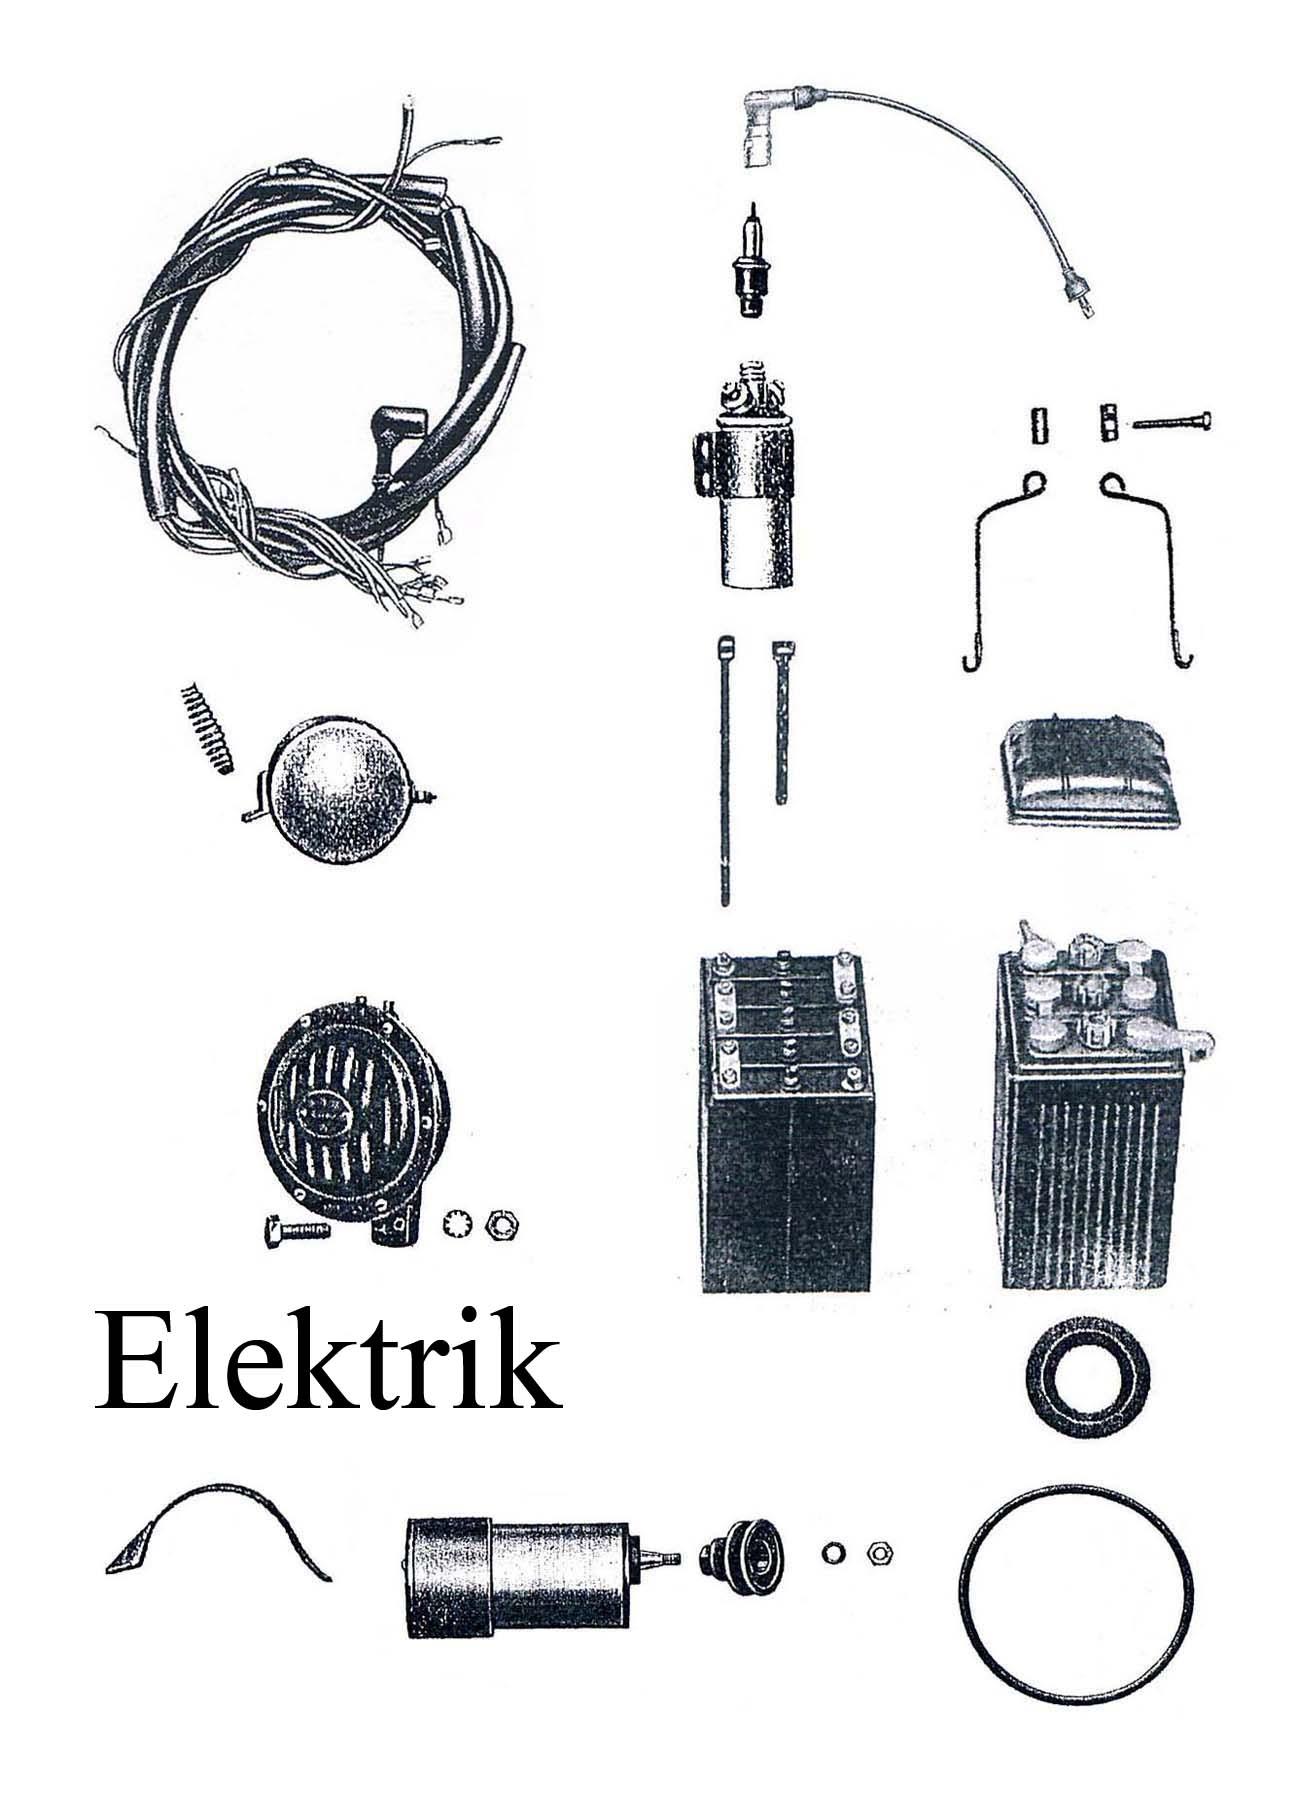 DDR-Motorrad EMW R 35 Ersatzteileliste Elektrik Batteriespannband Kabelbaum Lichtmaschine Zündkerze-spule Hupe